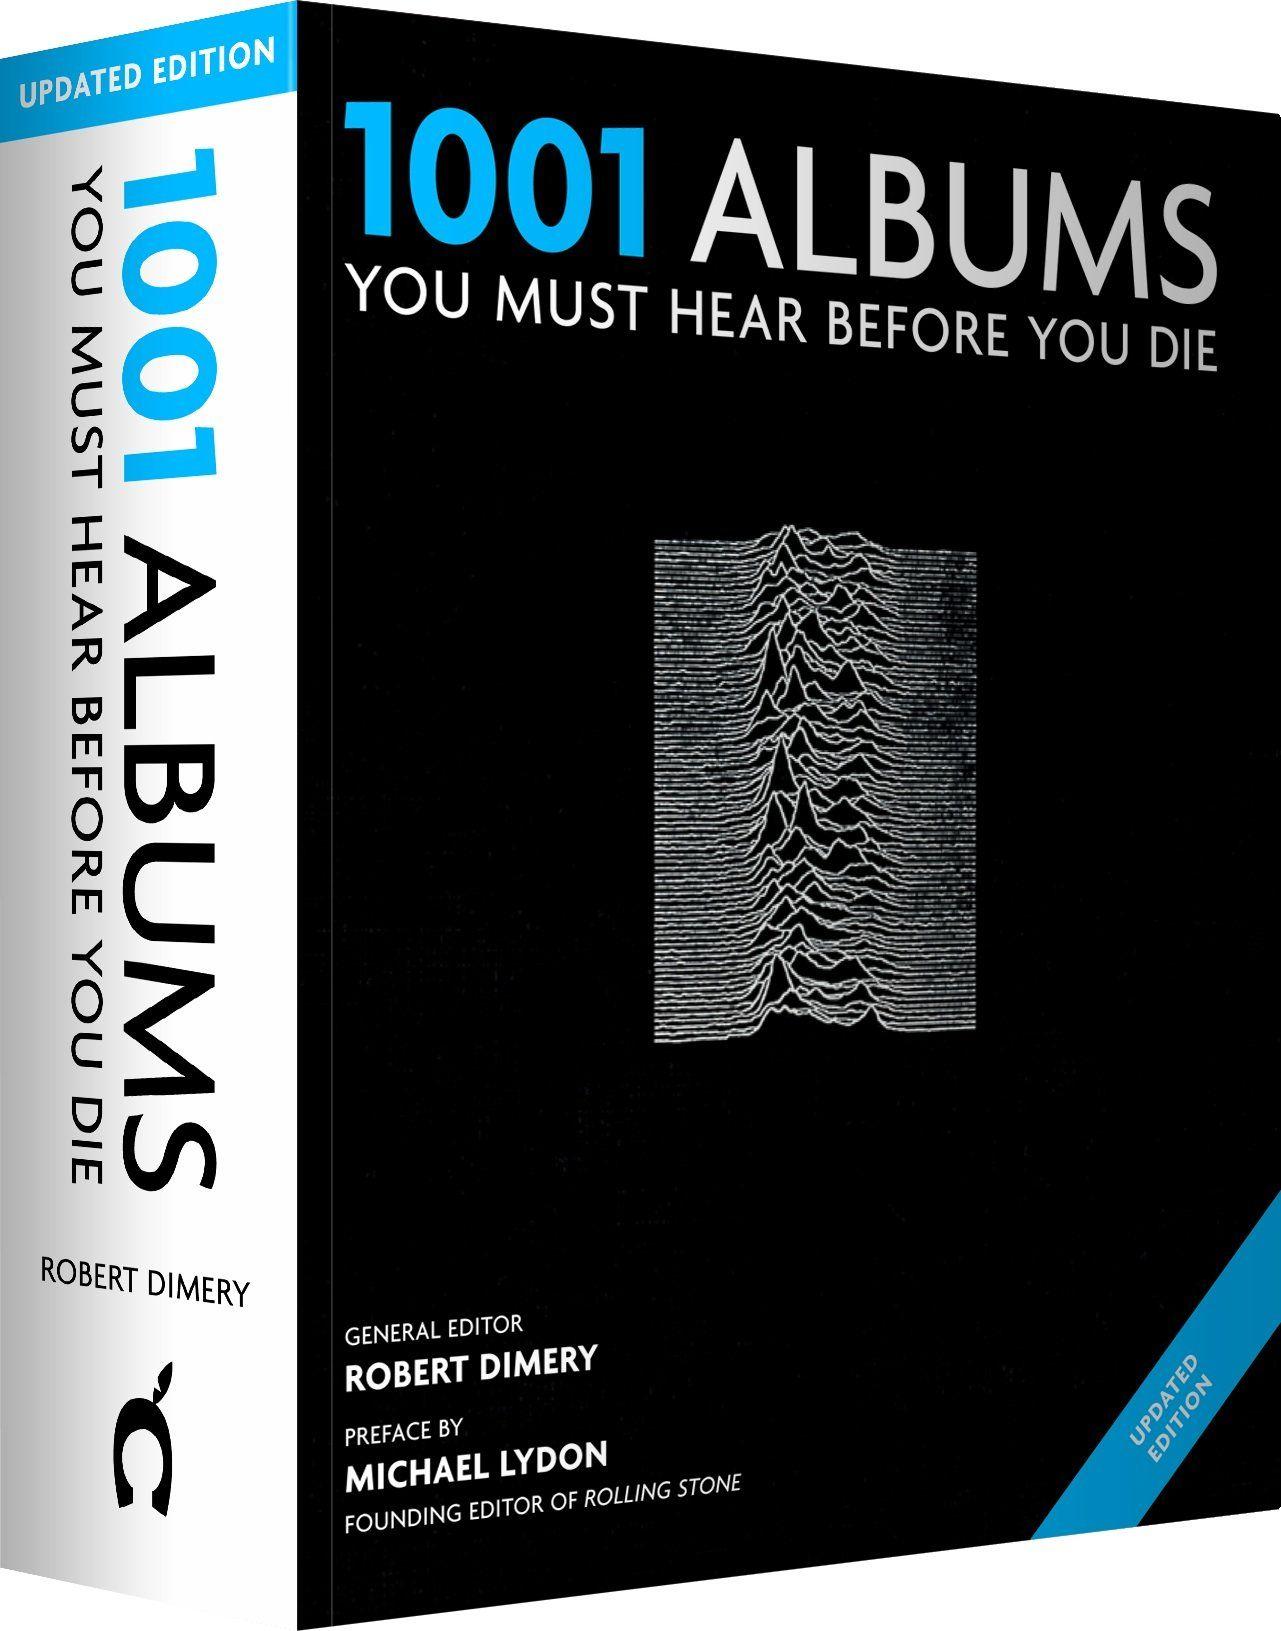 1001 Albums You Must Hear Before You Die 2013 Amazon De Robert Dimery Fremdsprachige Bucher Album Book Worms You Must